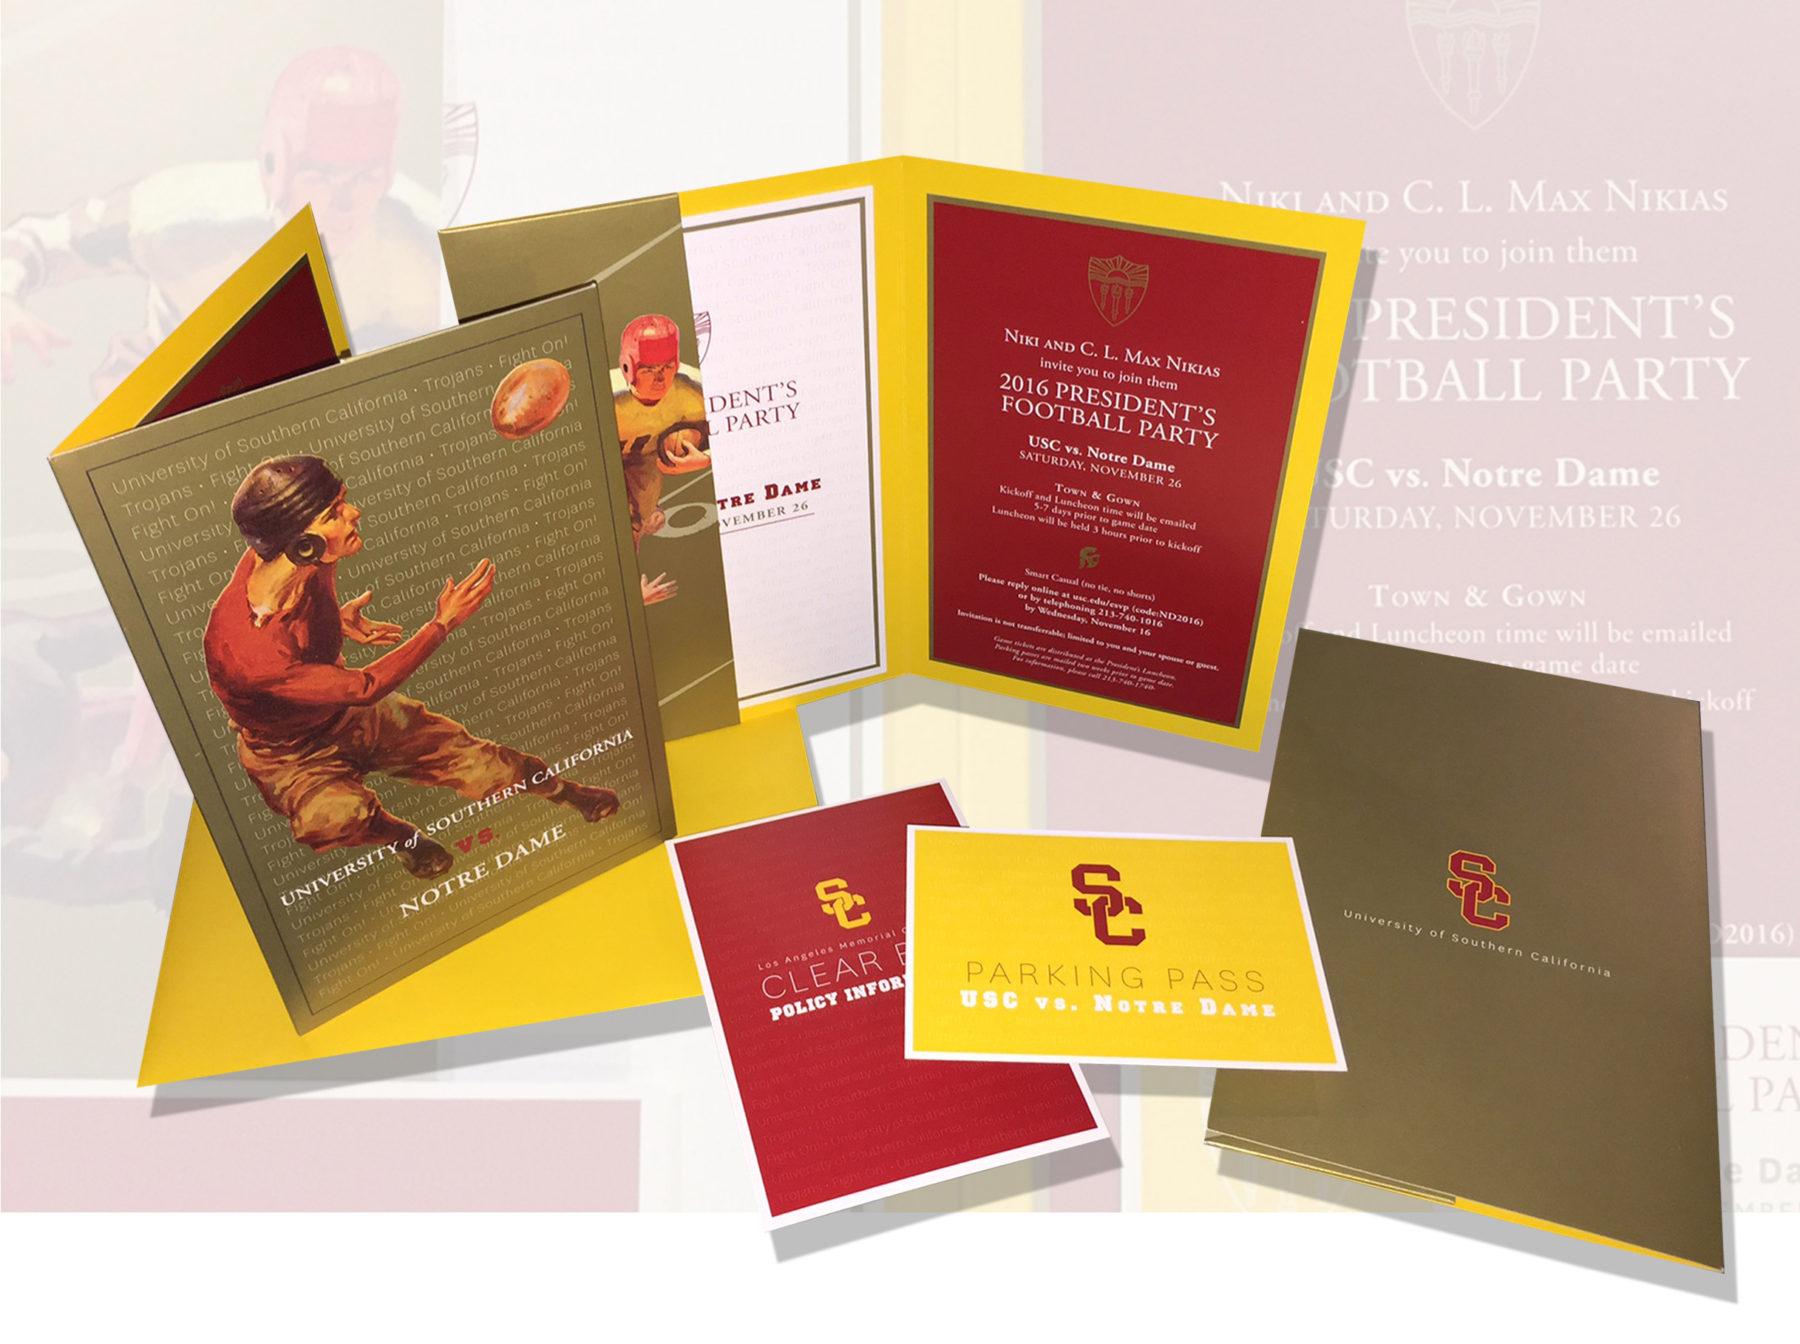 USC-football-row-5 - Card Tricks Designs